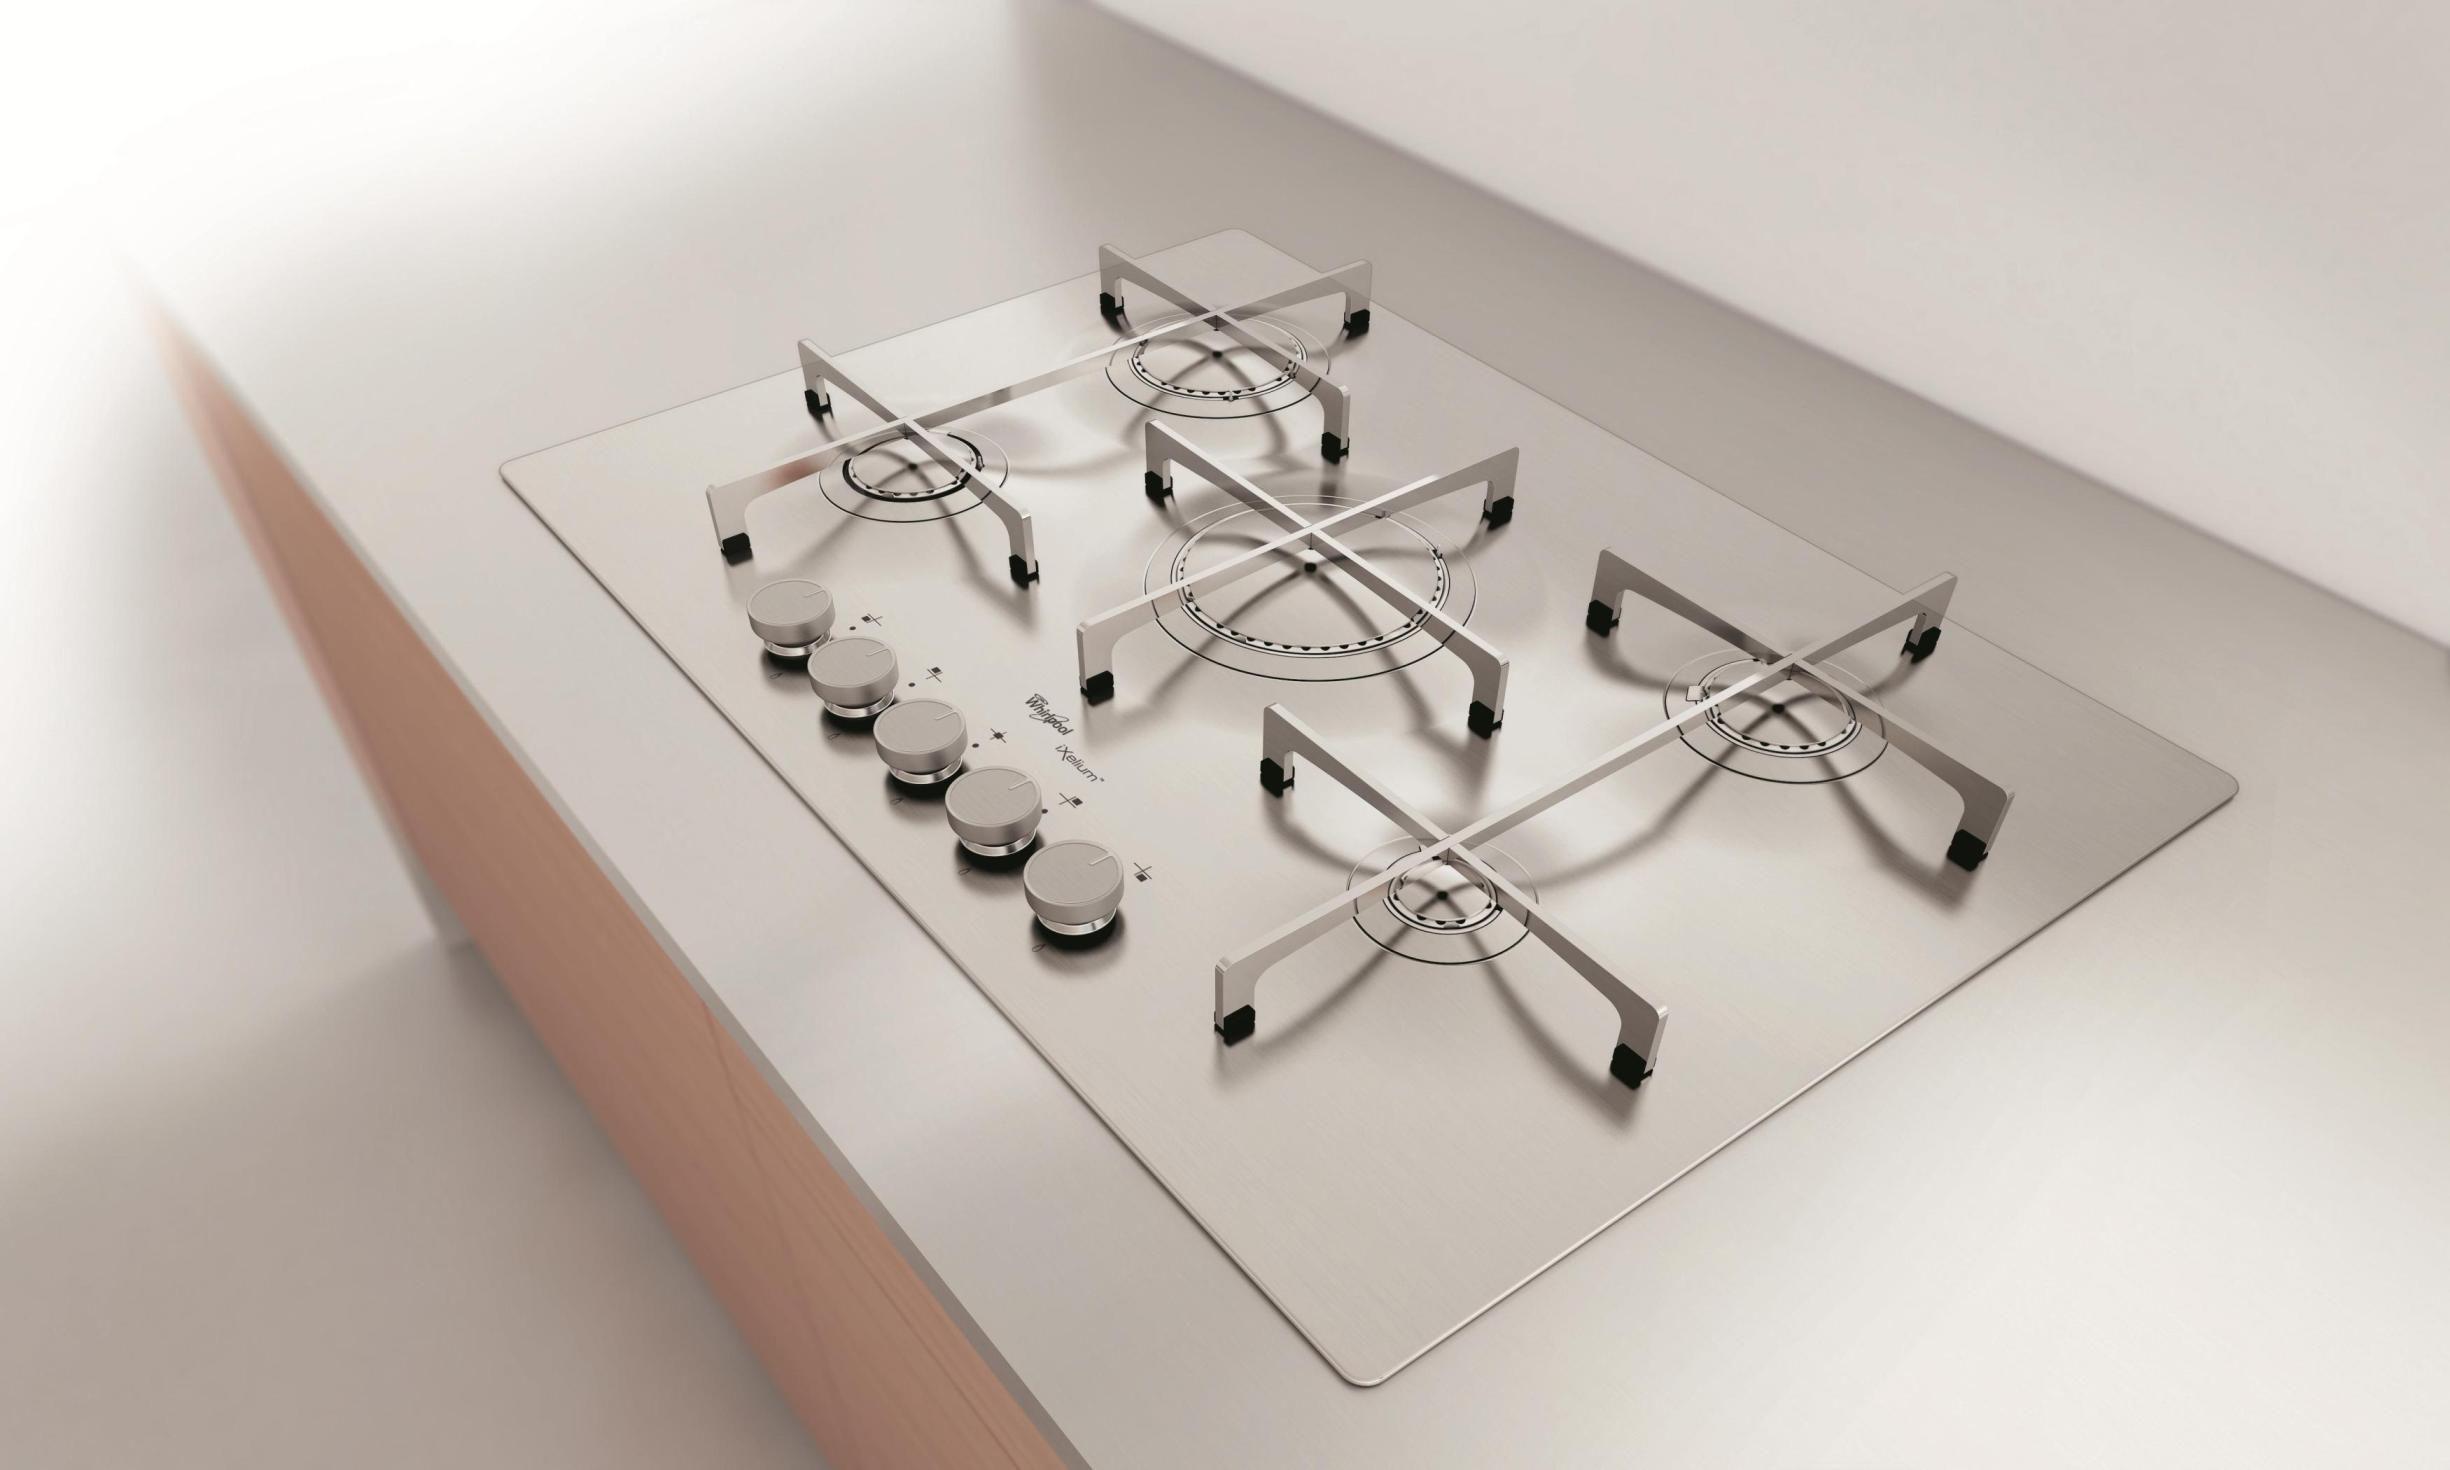 Brushed Gold Kitchen Appliances